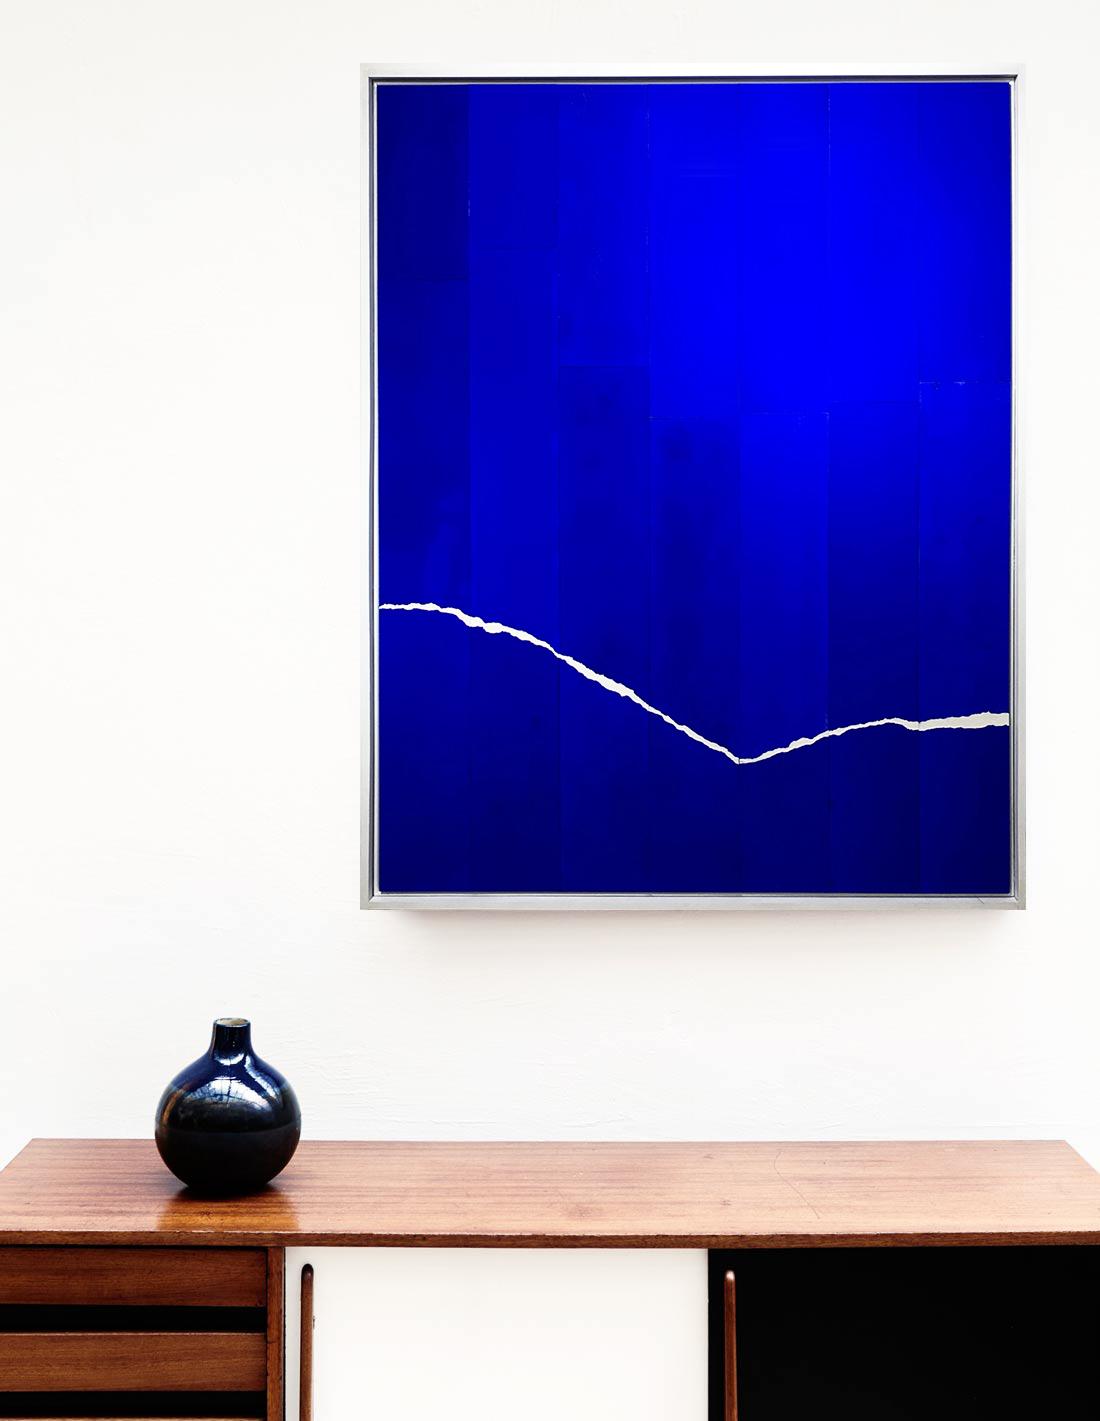 Bernard Gortais - Oeuvre sur papier - Continuum 2